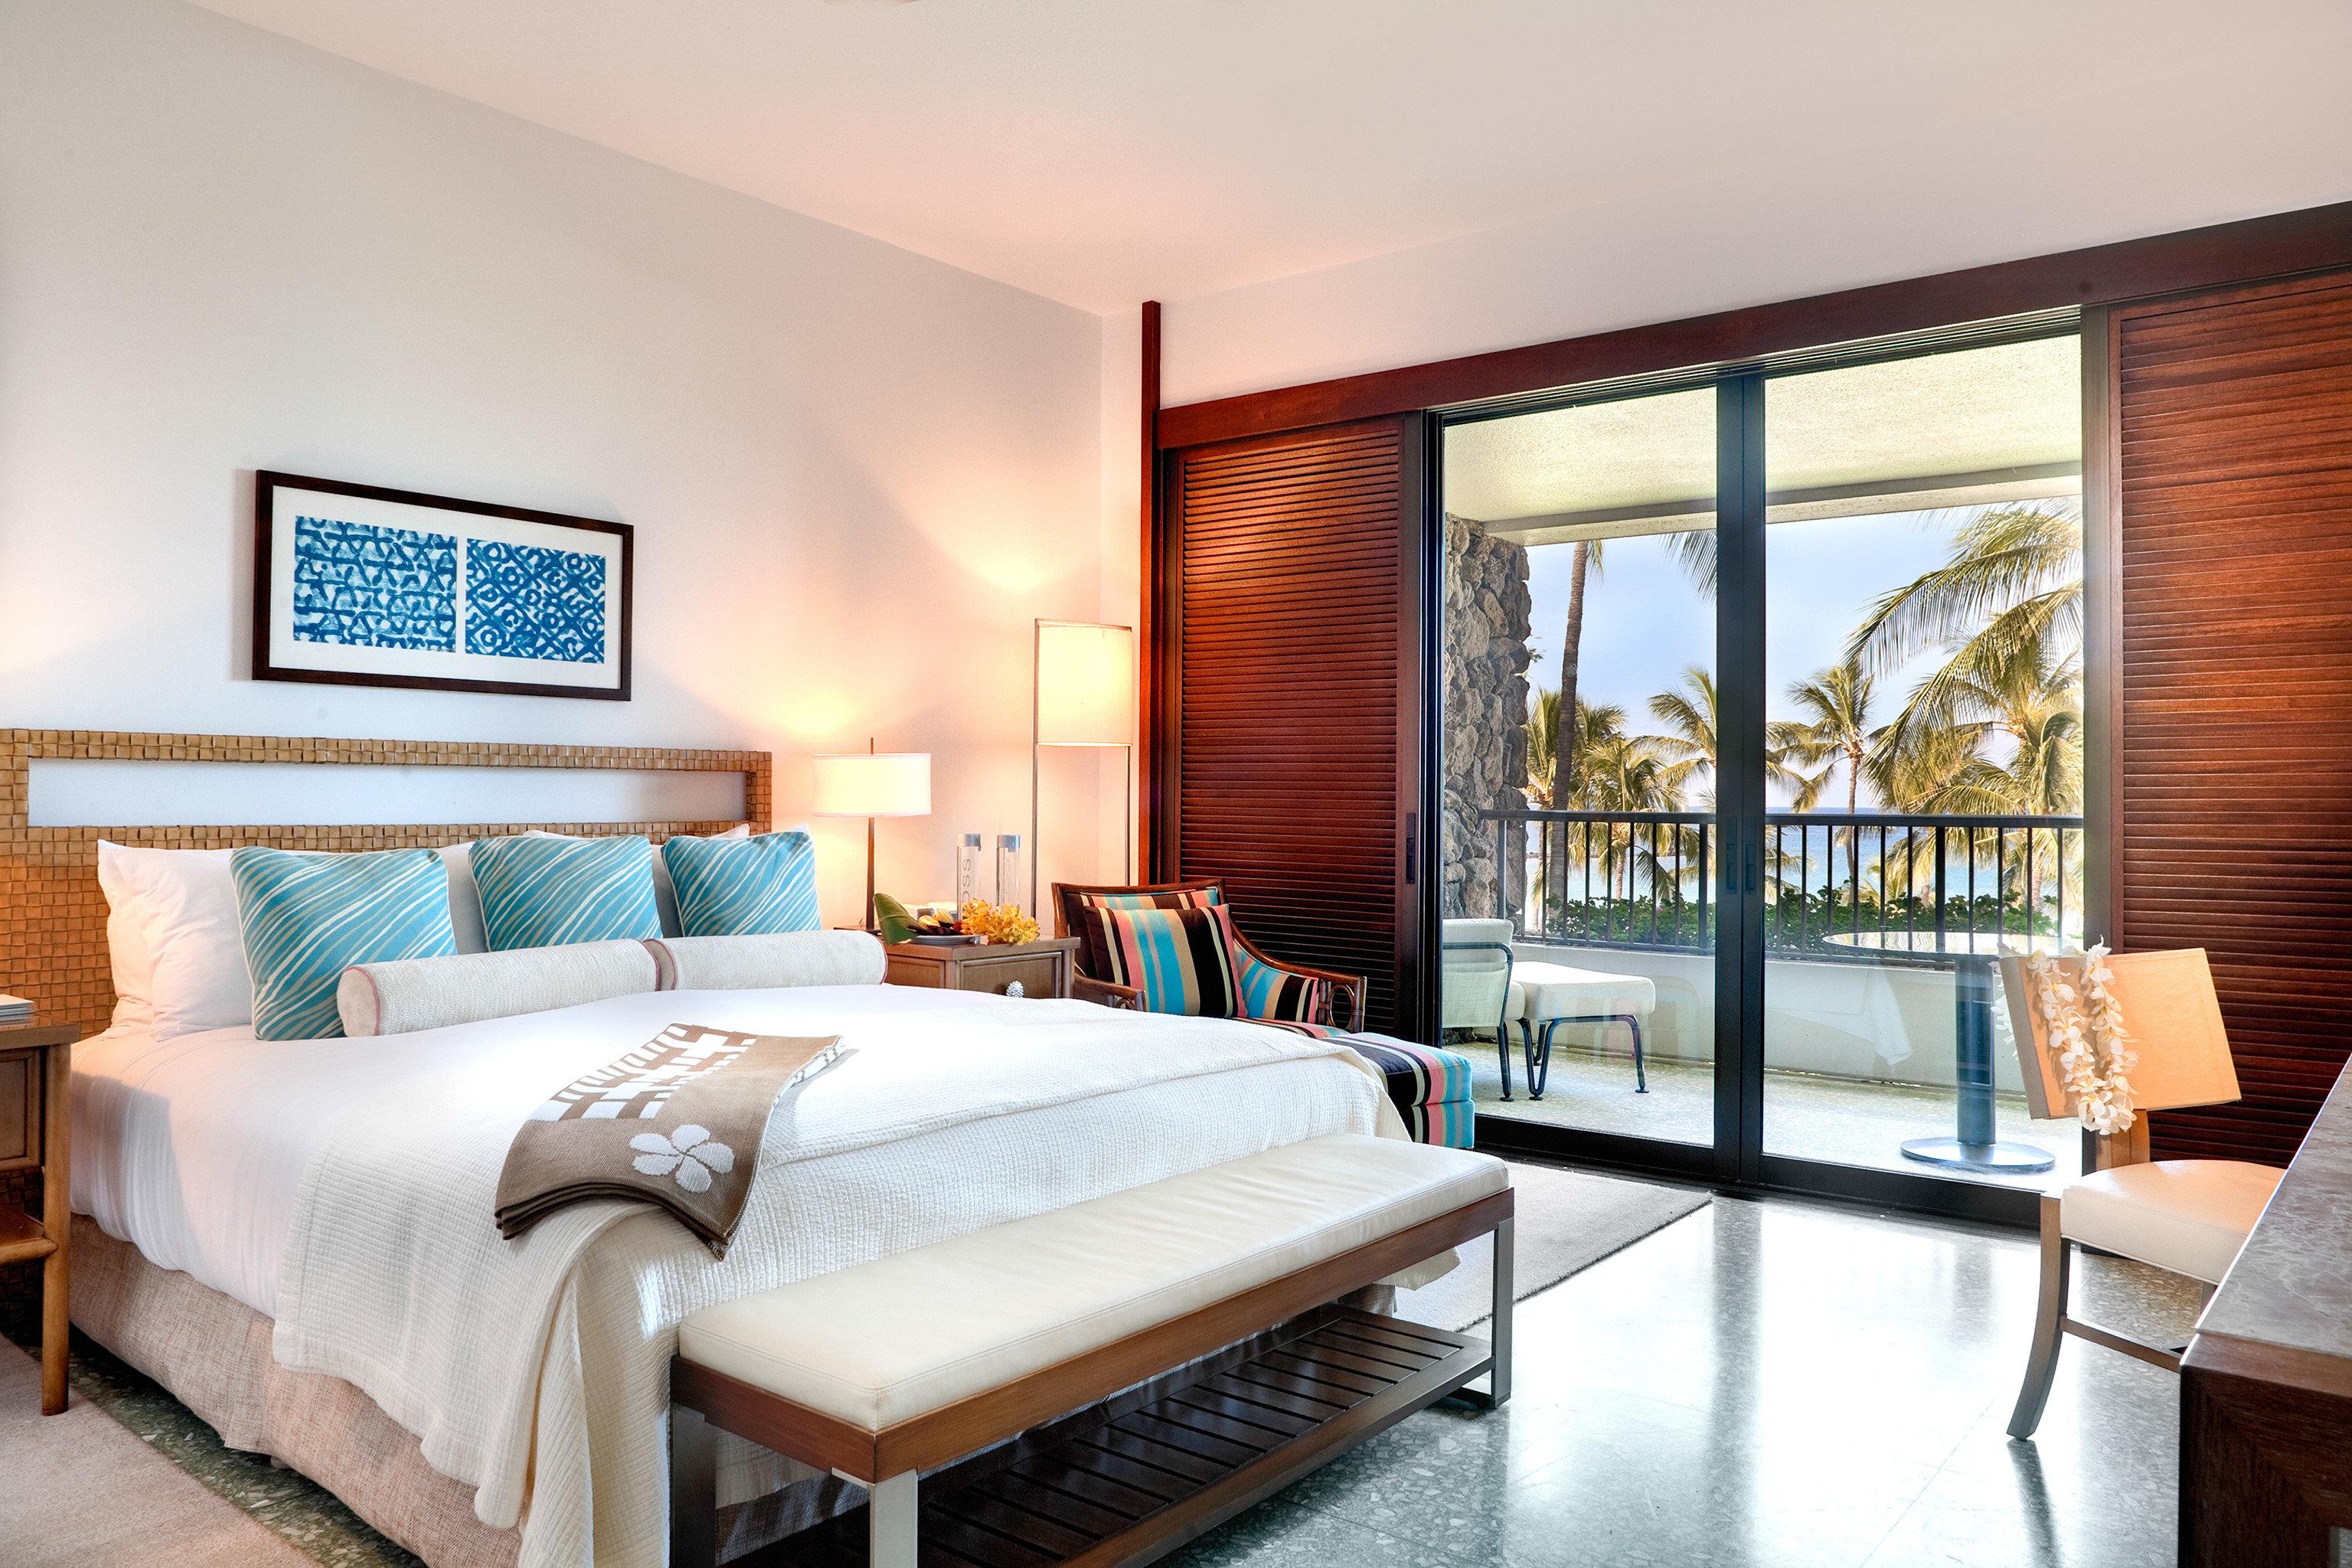 Balcony Beach Bedroom Resort Scenic views sofa property Suite living room home hardwood condominium Villa cottage